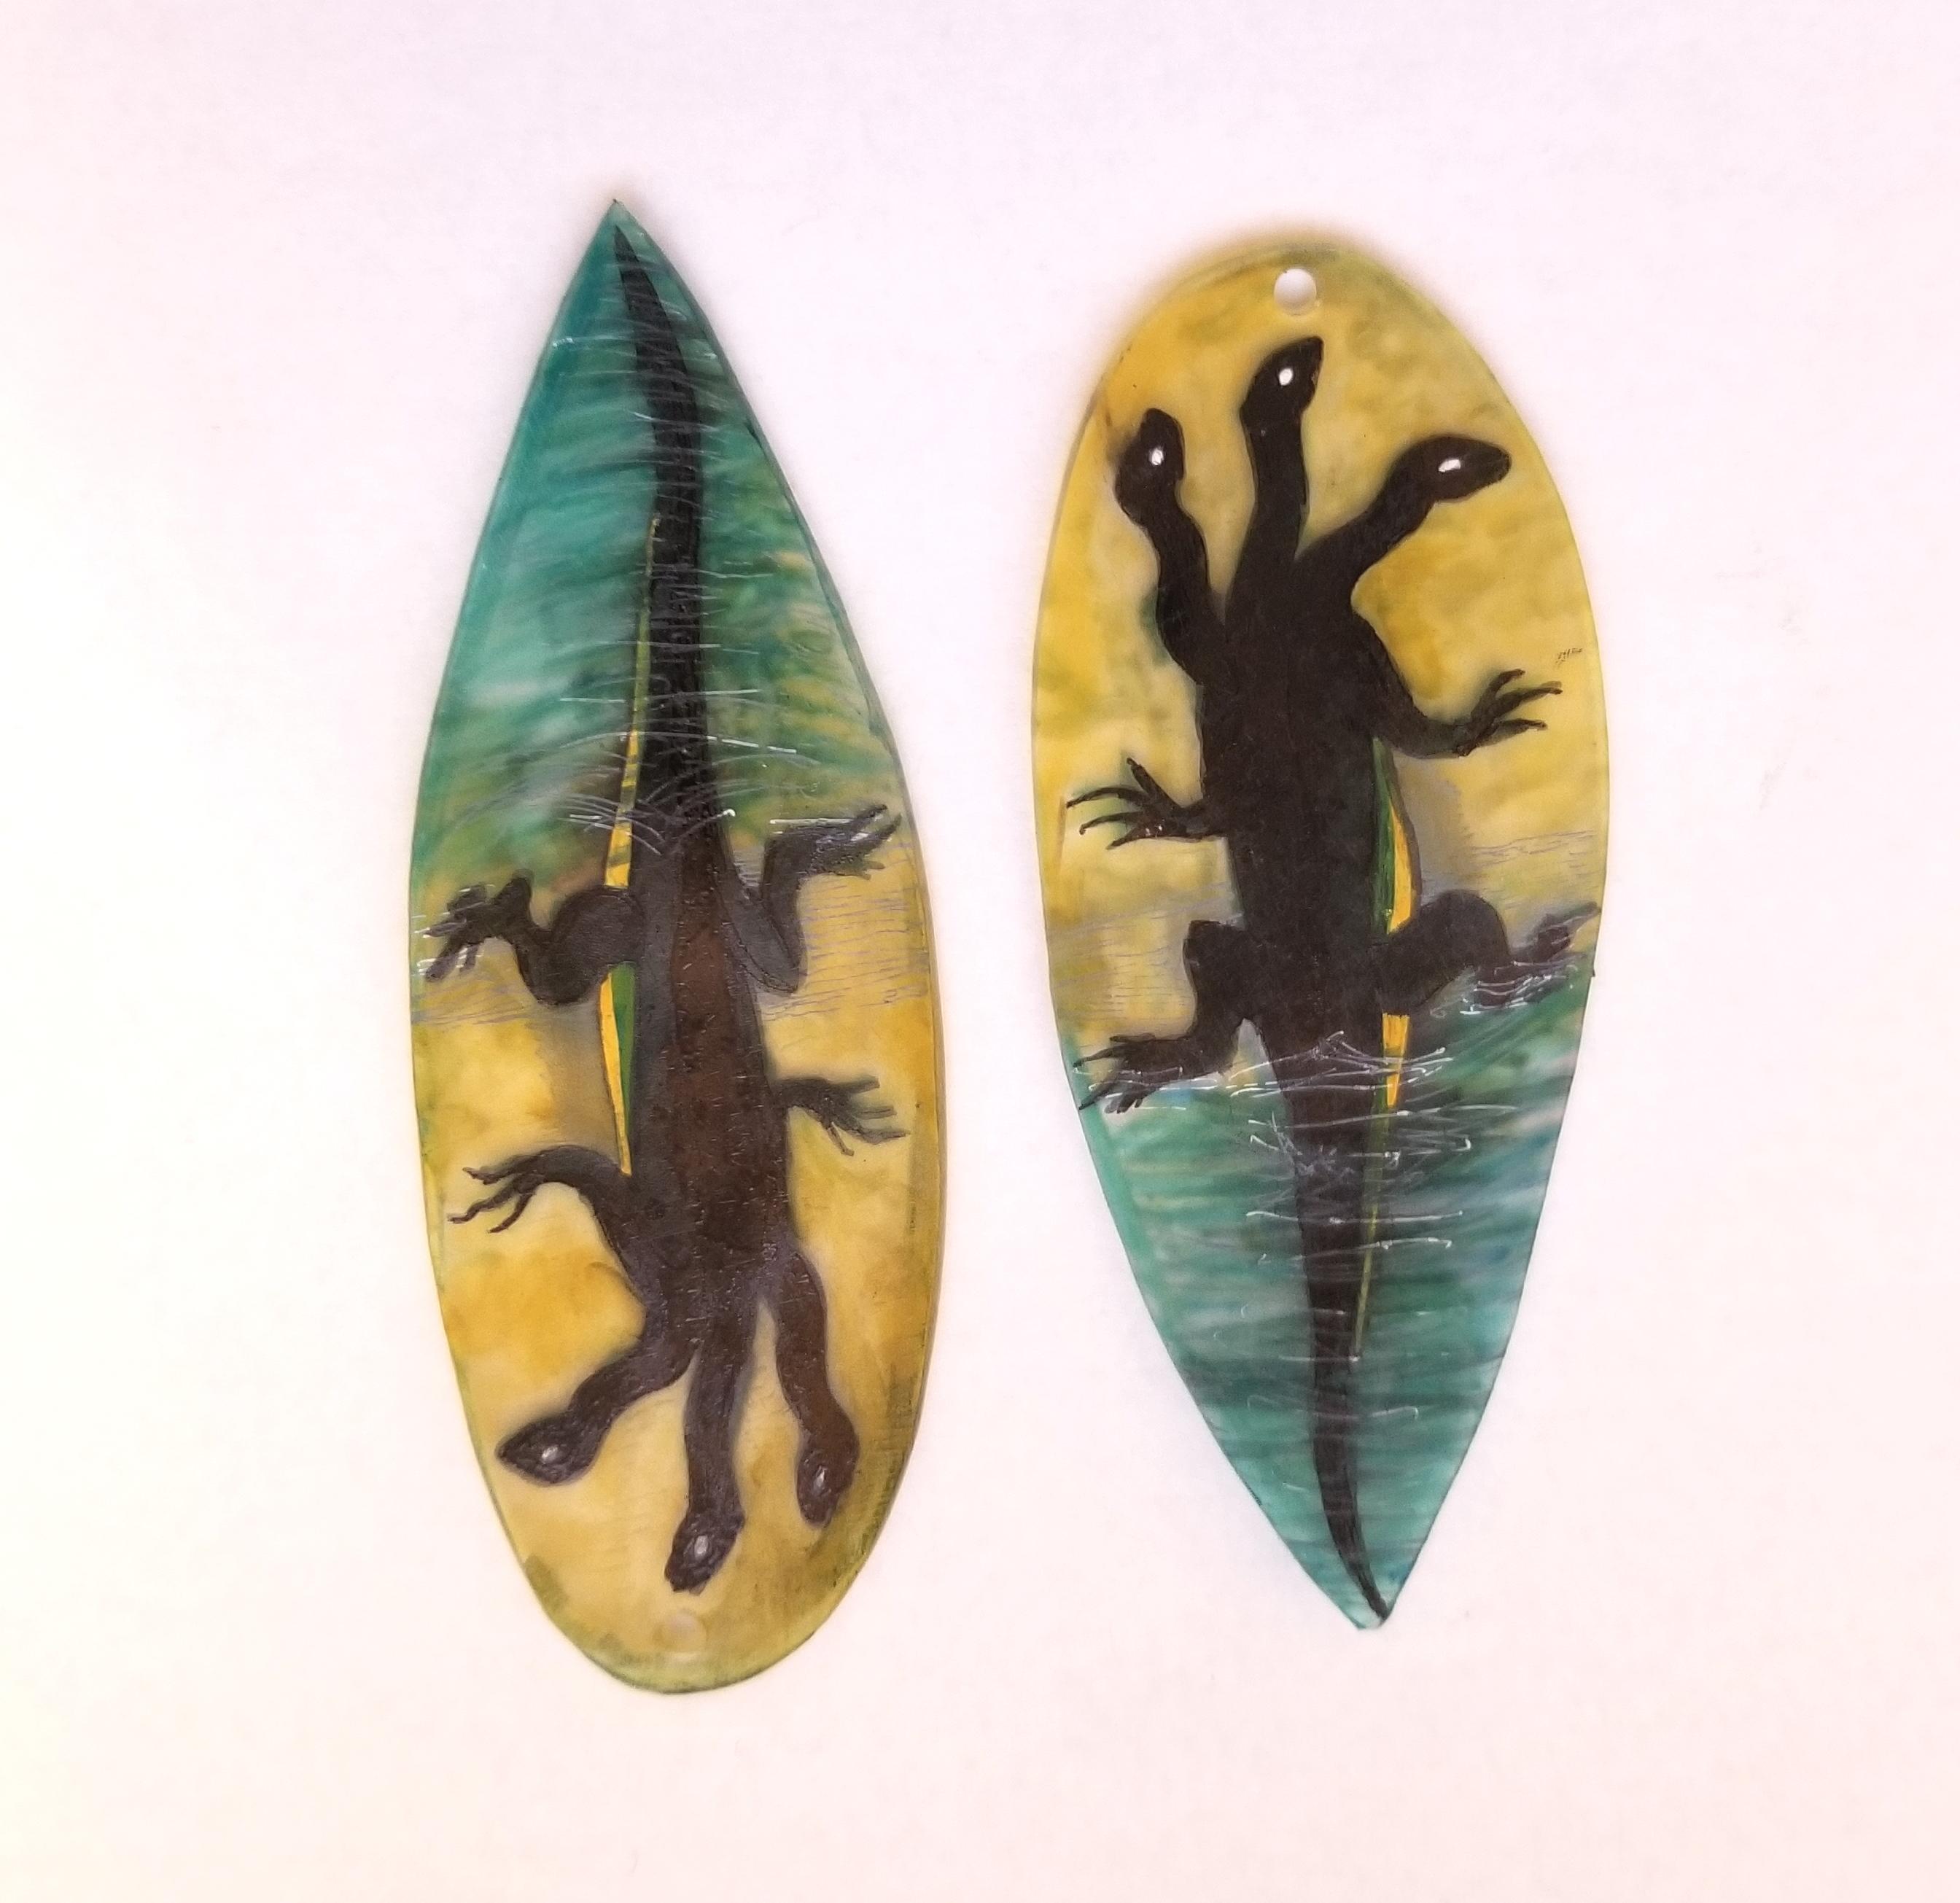 Hieronymus Bosch Three Headed Lizard